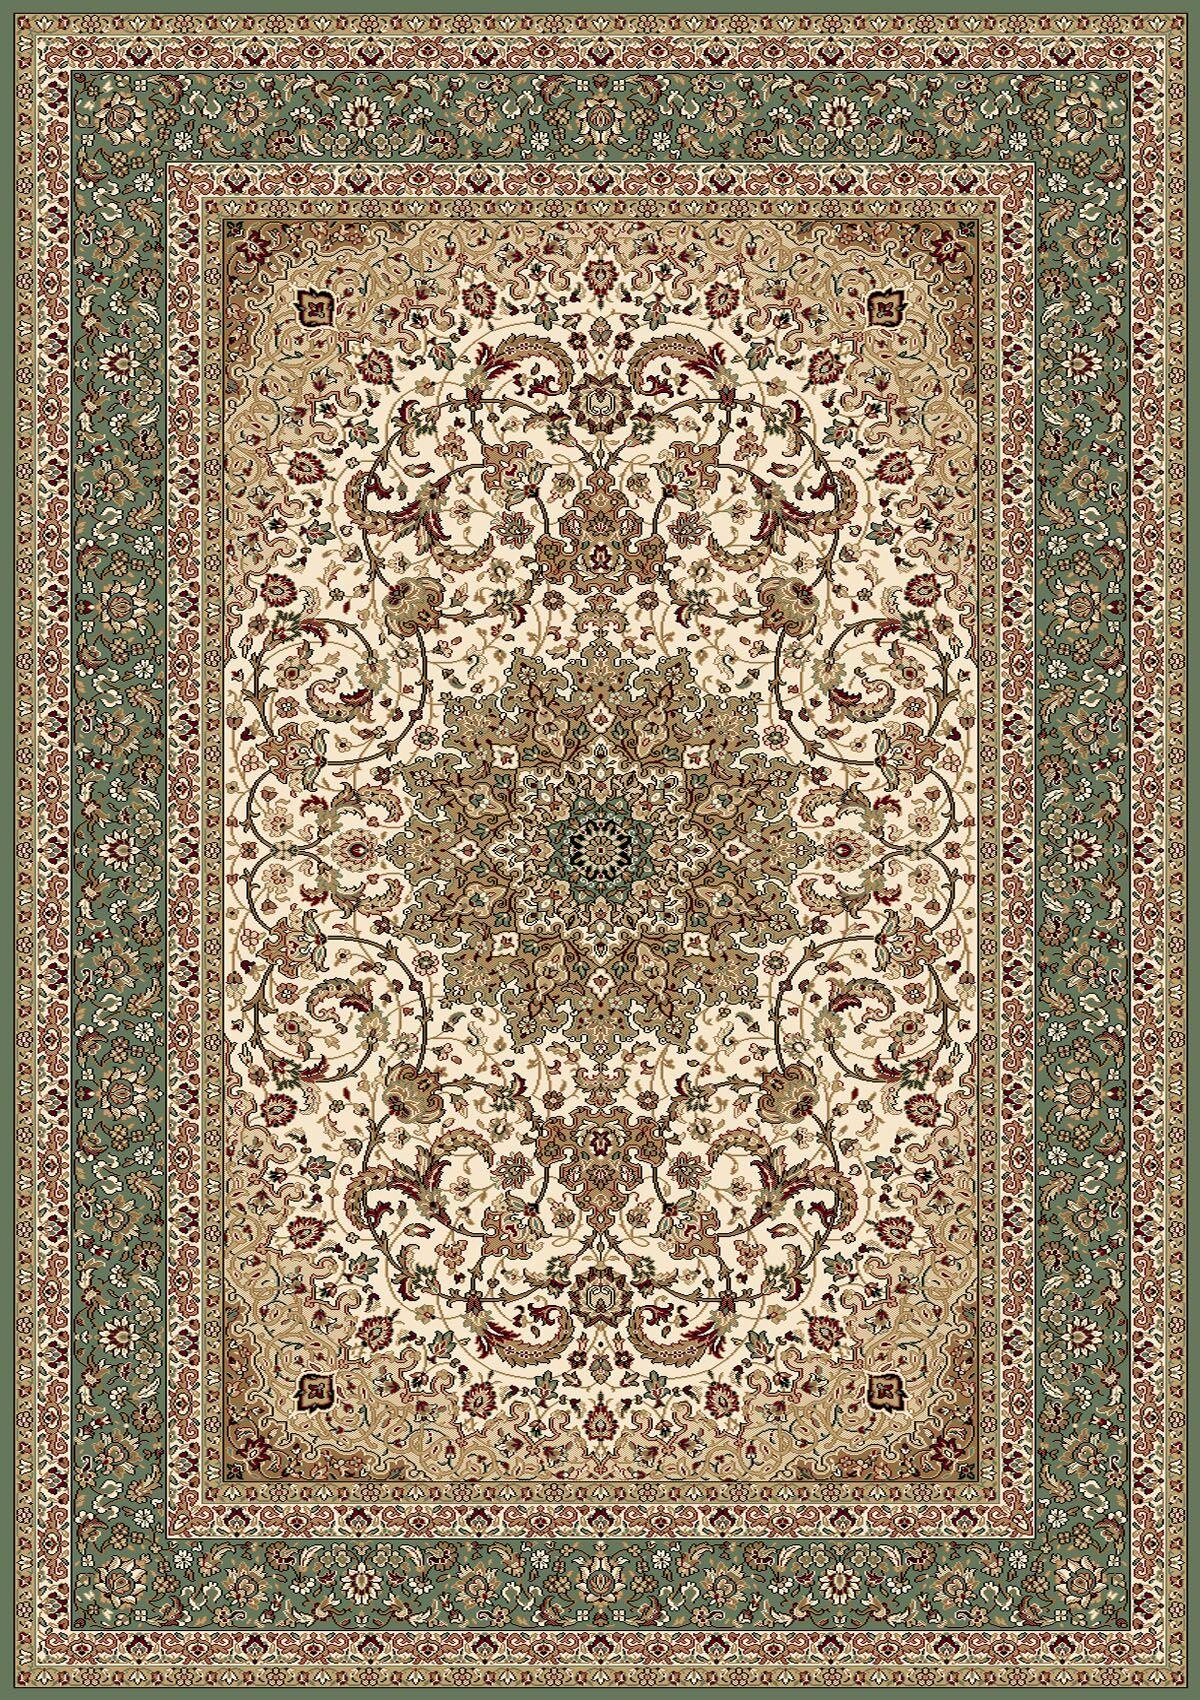 Regency Ivory/Green Area Rug Rug Size: Rectangle 8' x 10'2